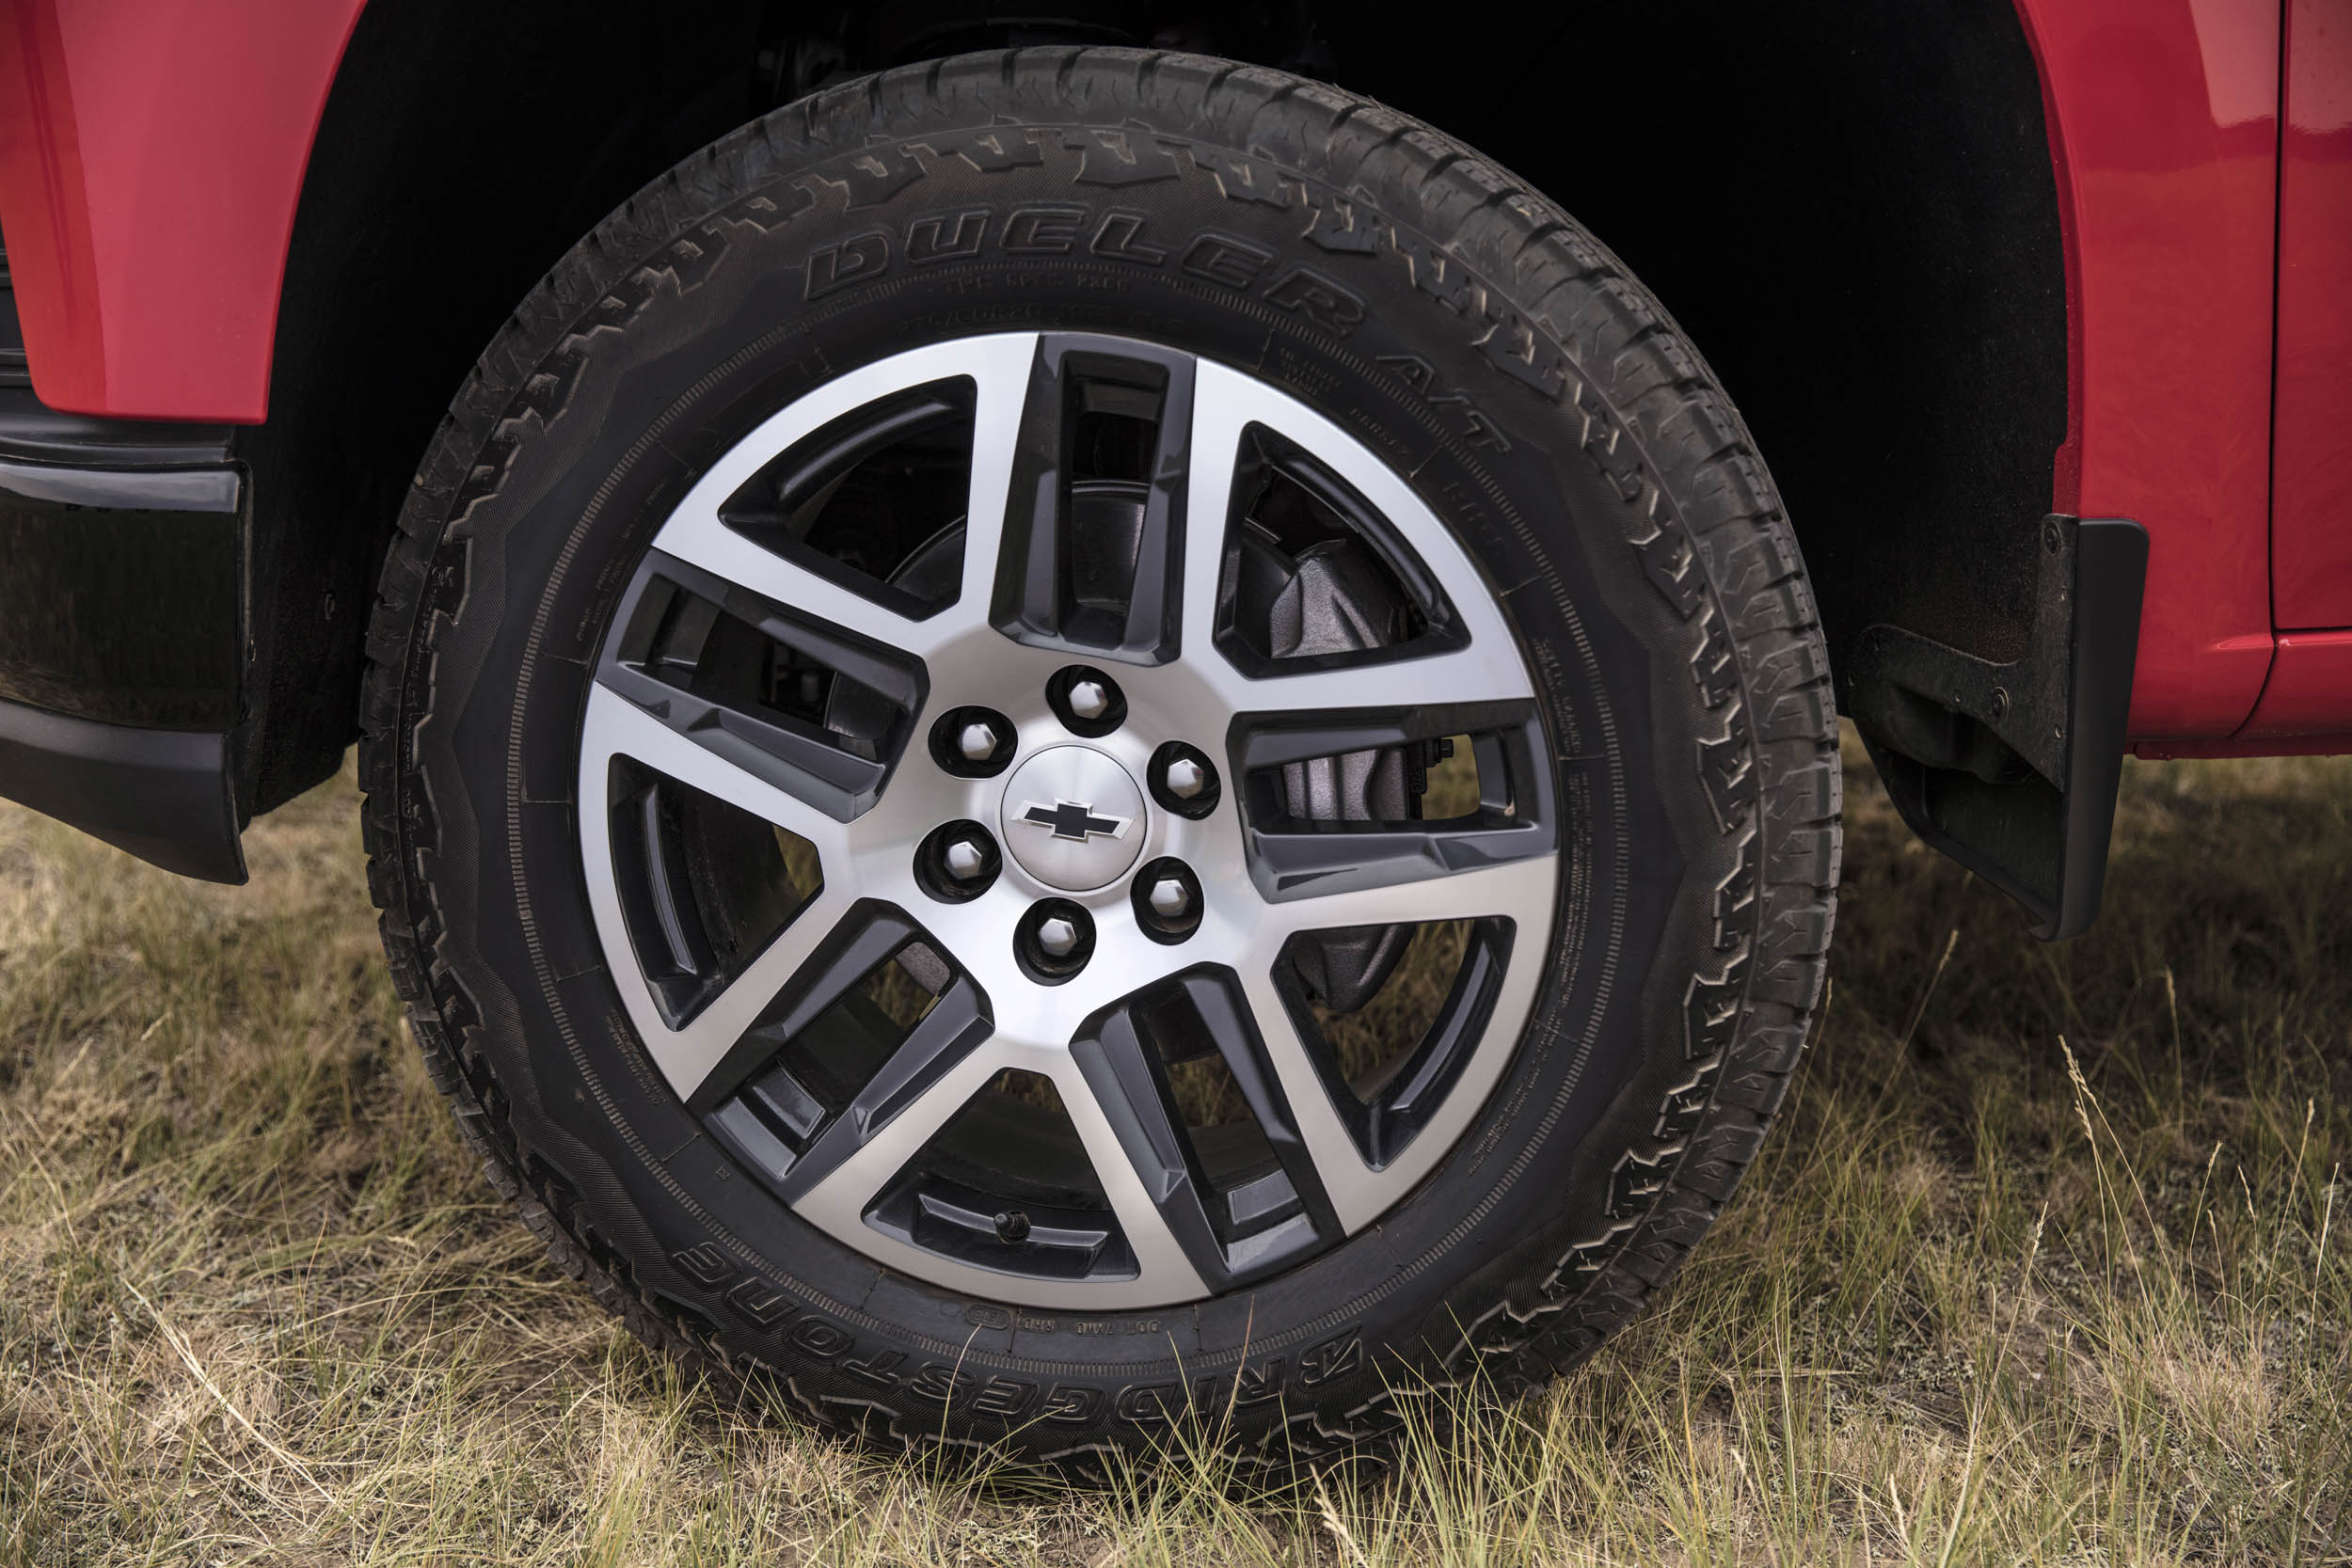 2019 chevrolet silverado Trail Boss tire